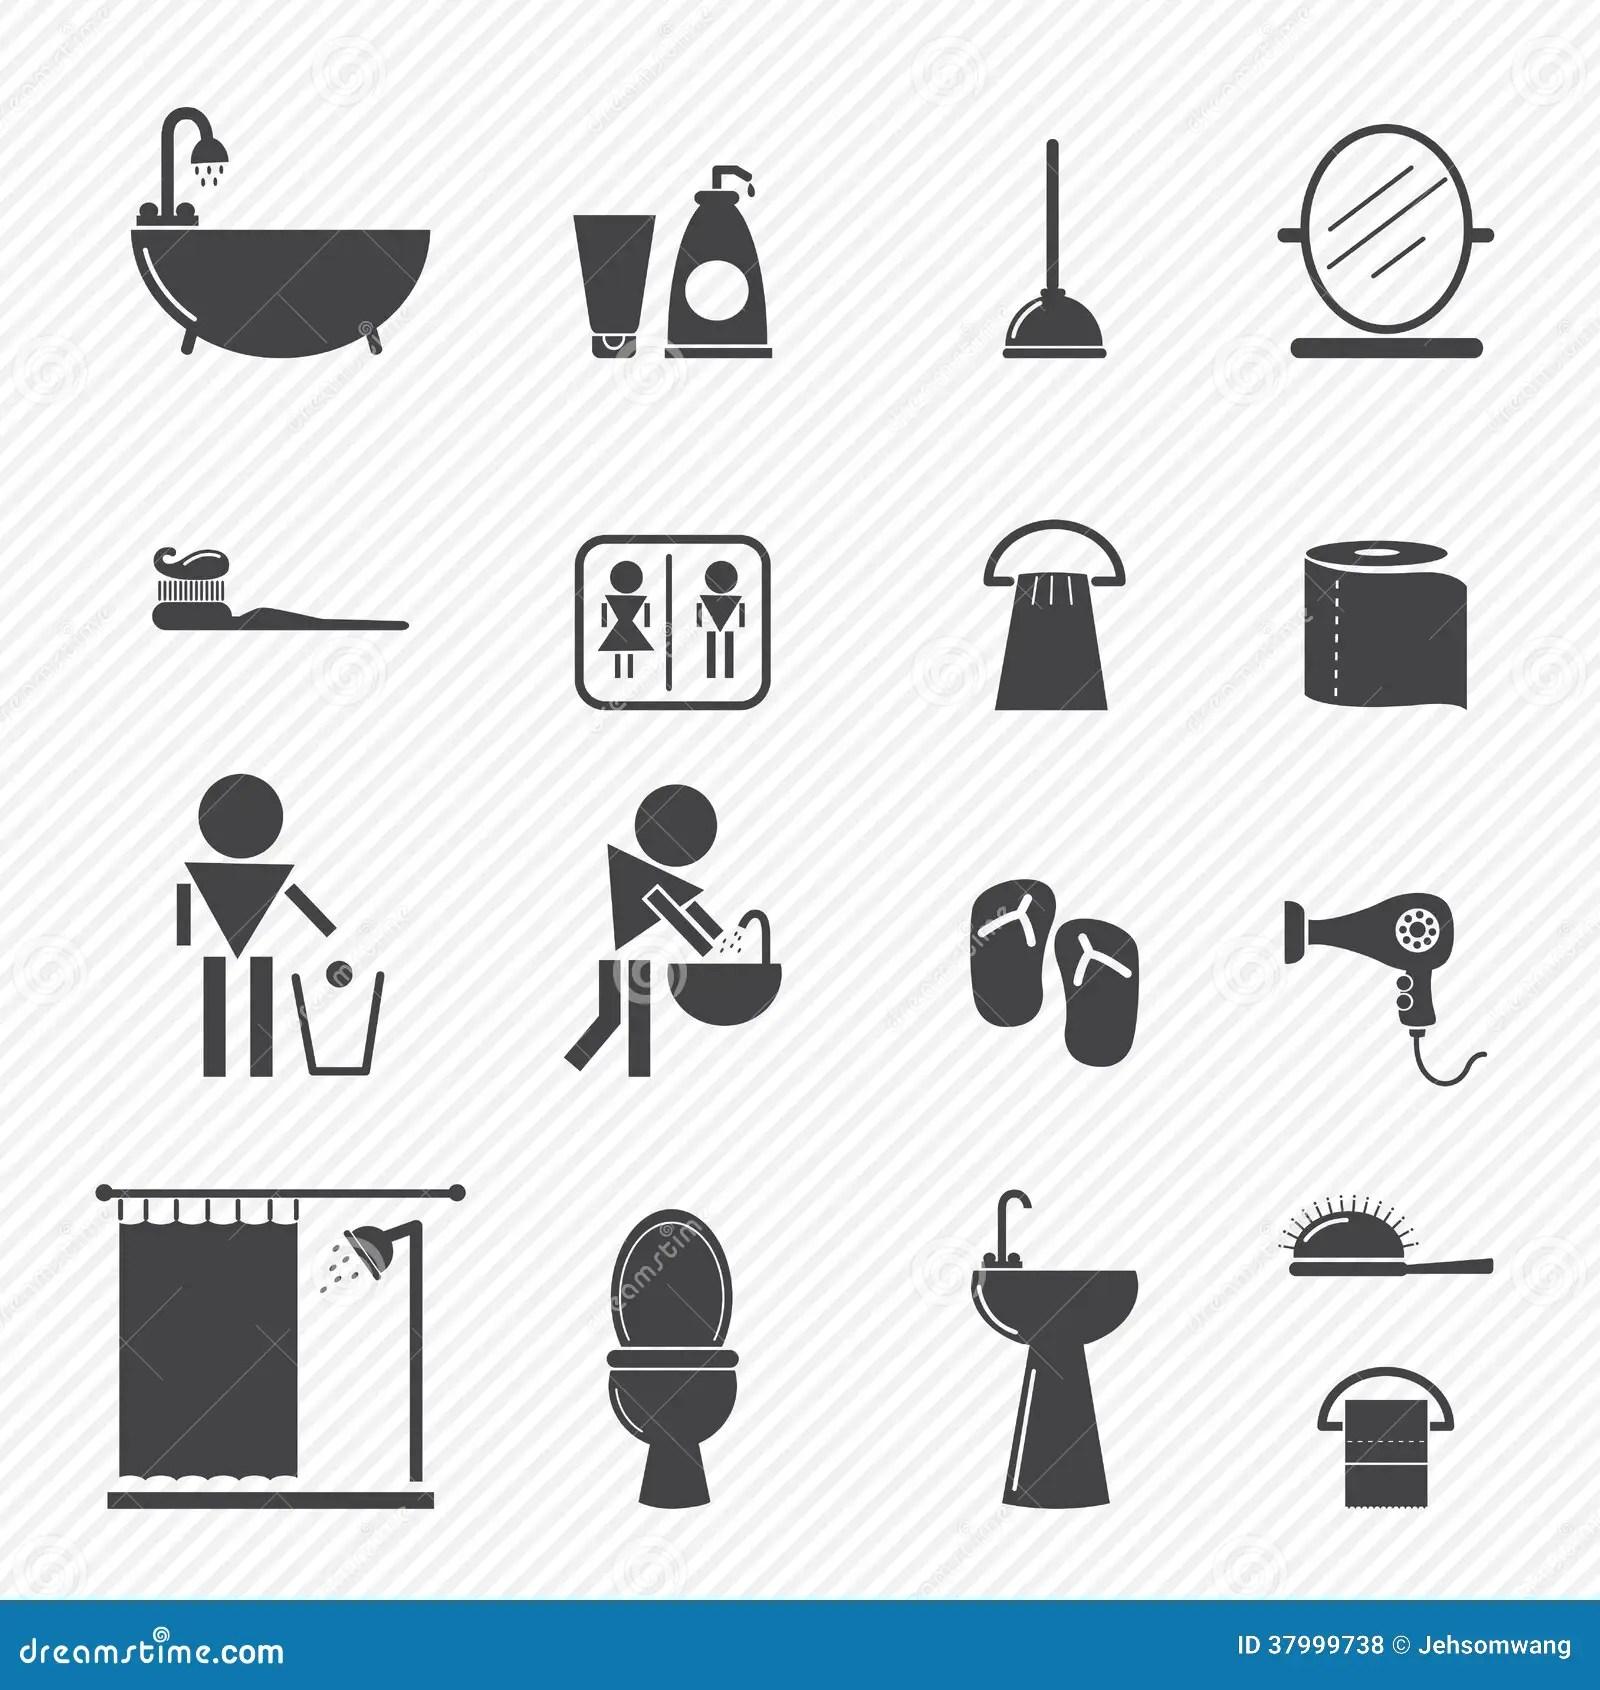 Bathroom Icons Royalty Free Stock Photos